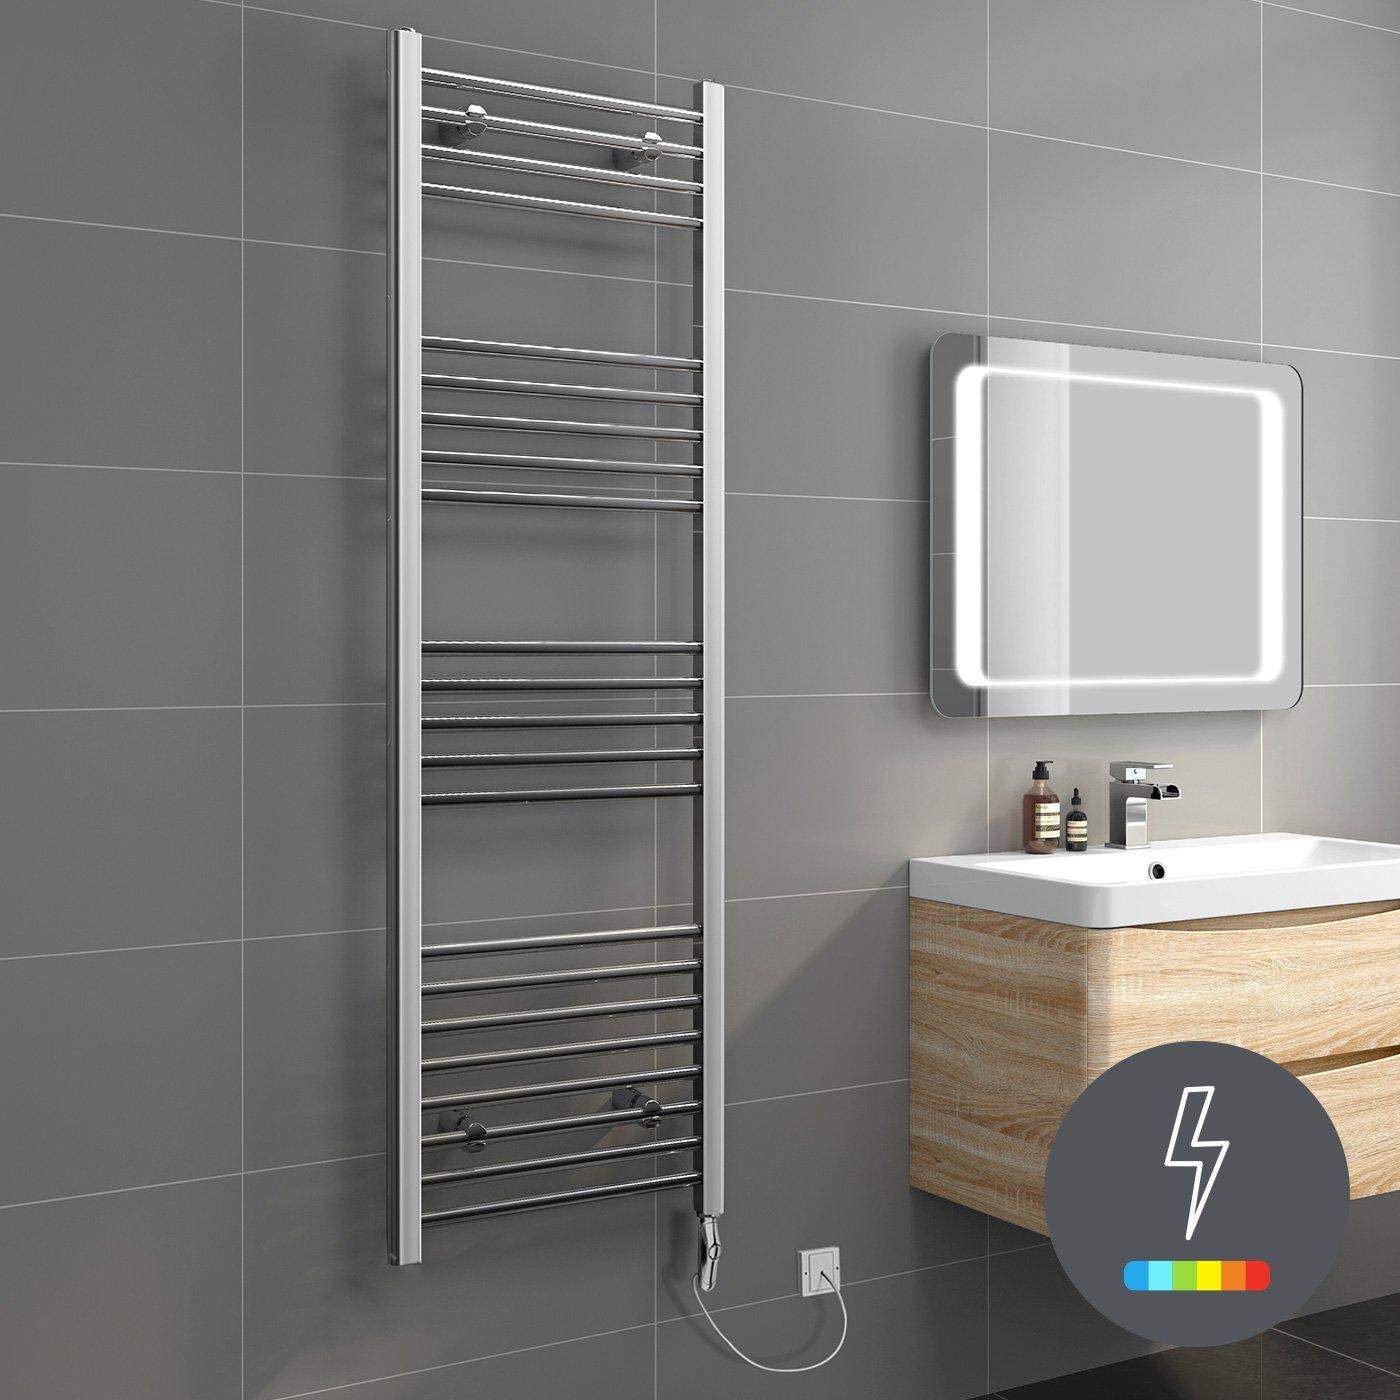 1600 x 500 iBathUK   1200 x 600 Thermostatic Electric Heated Towel Rail Bathroom Radiator